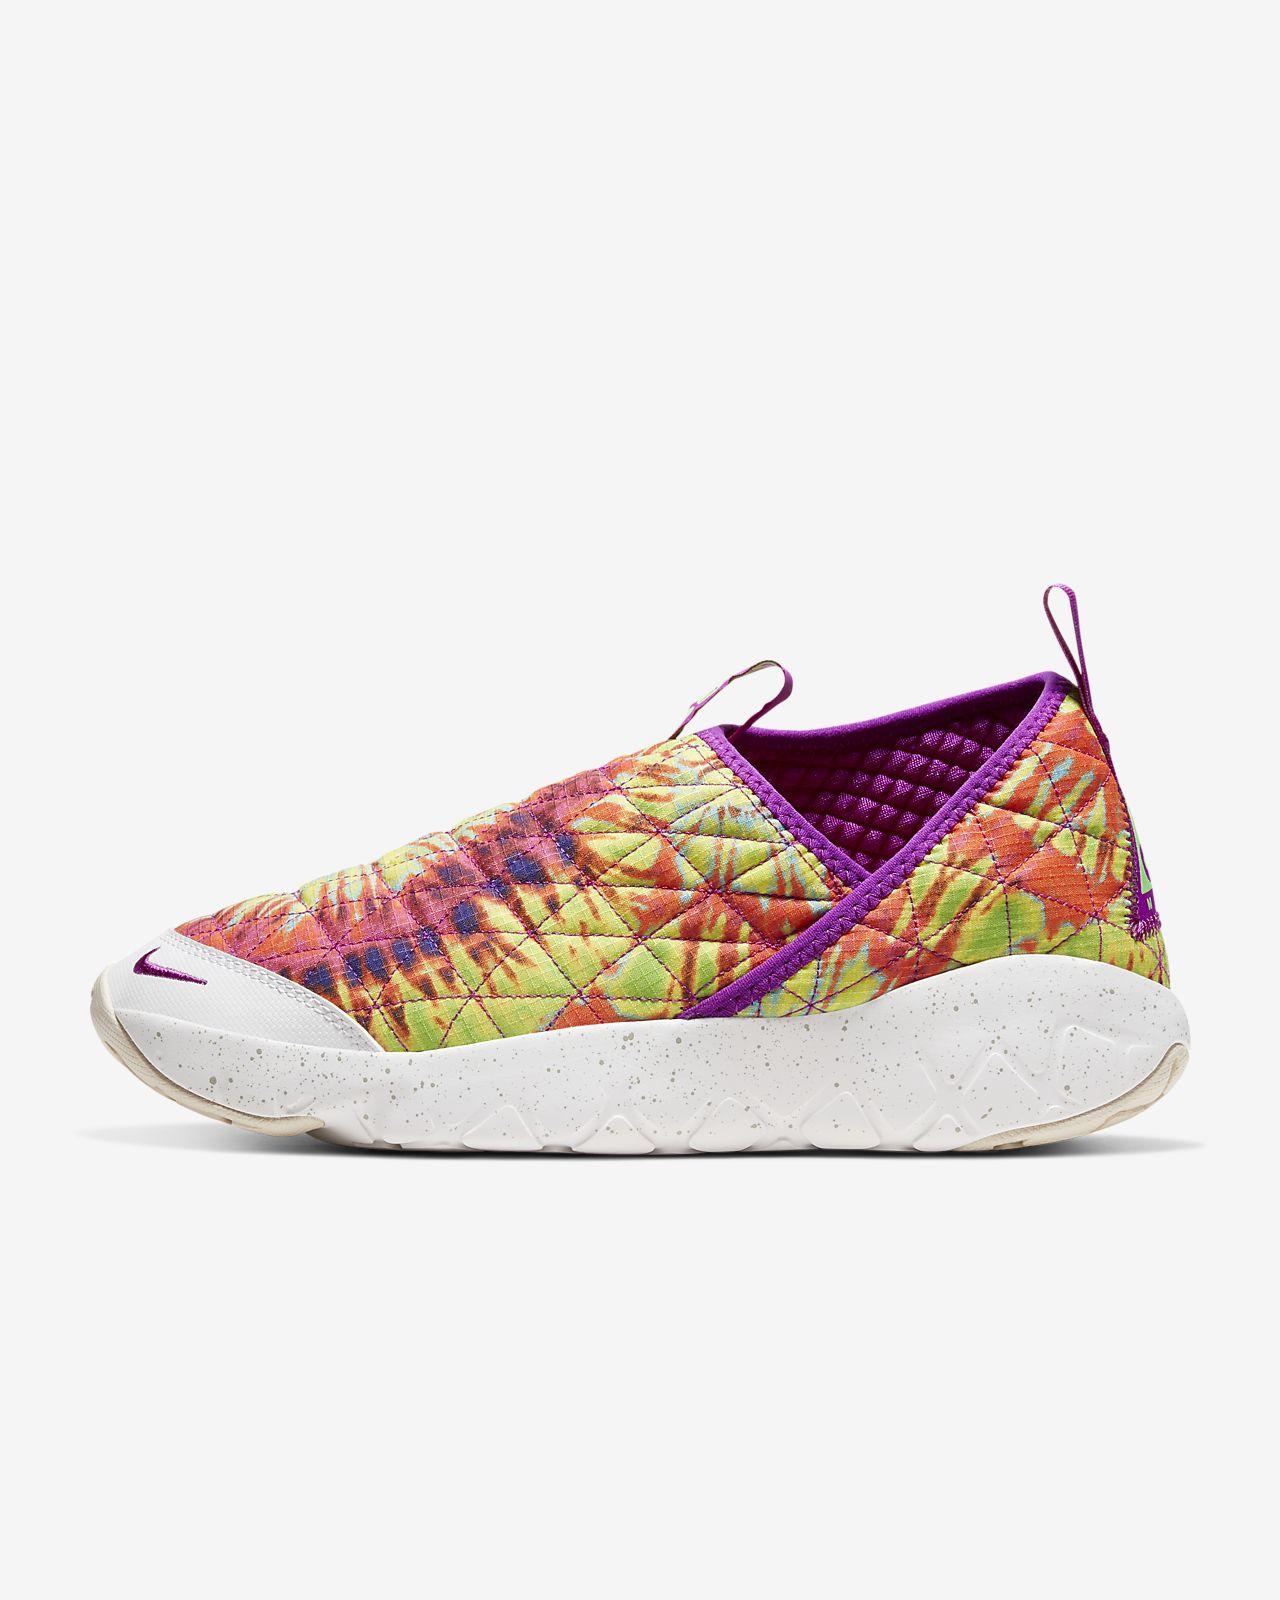 Scarpa Nike ACG MOC 3.0